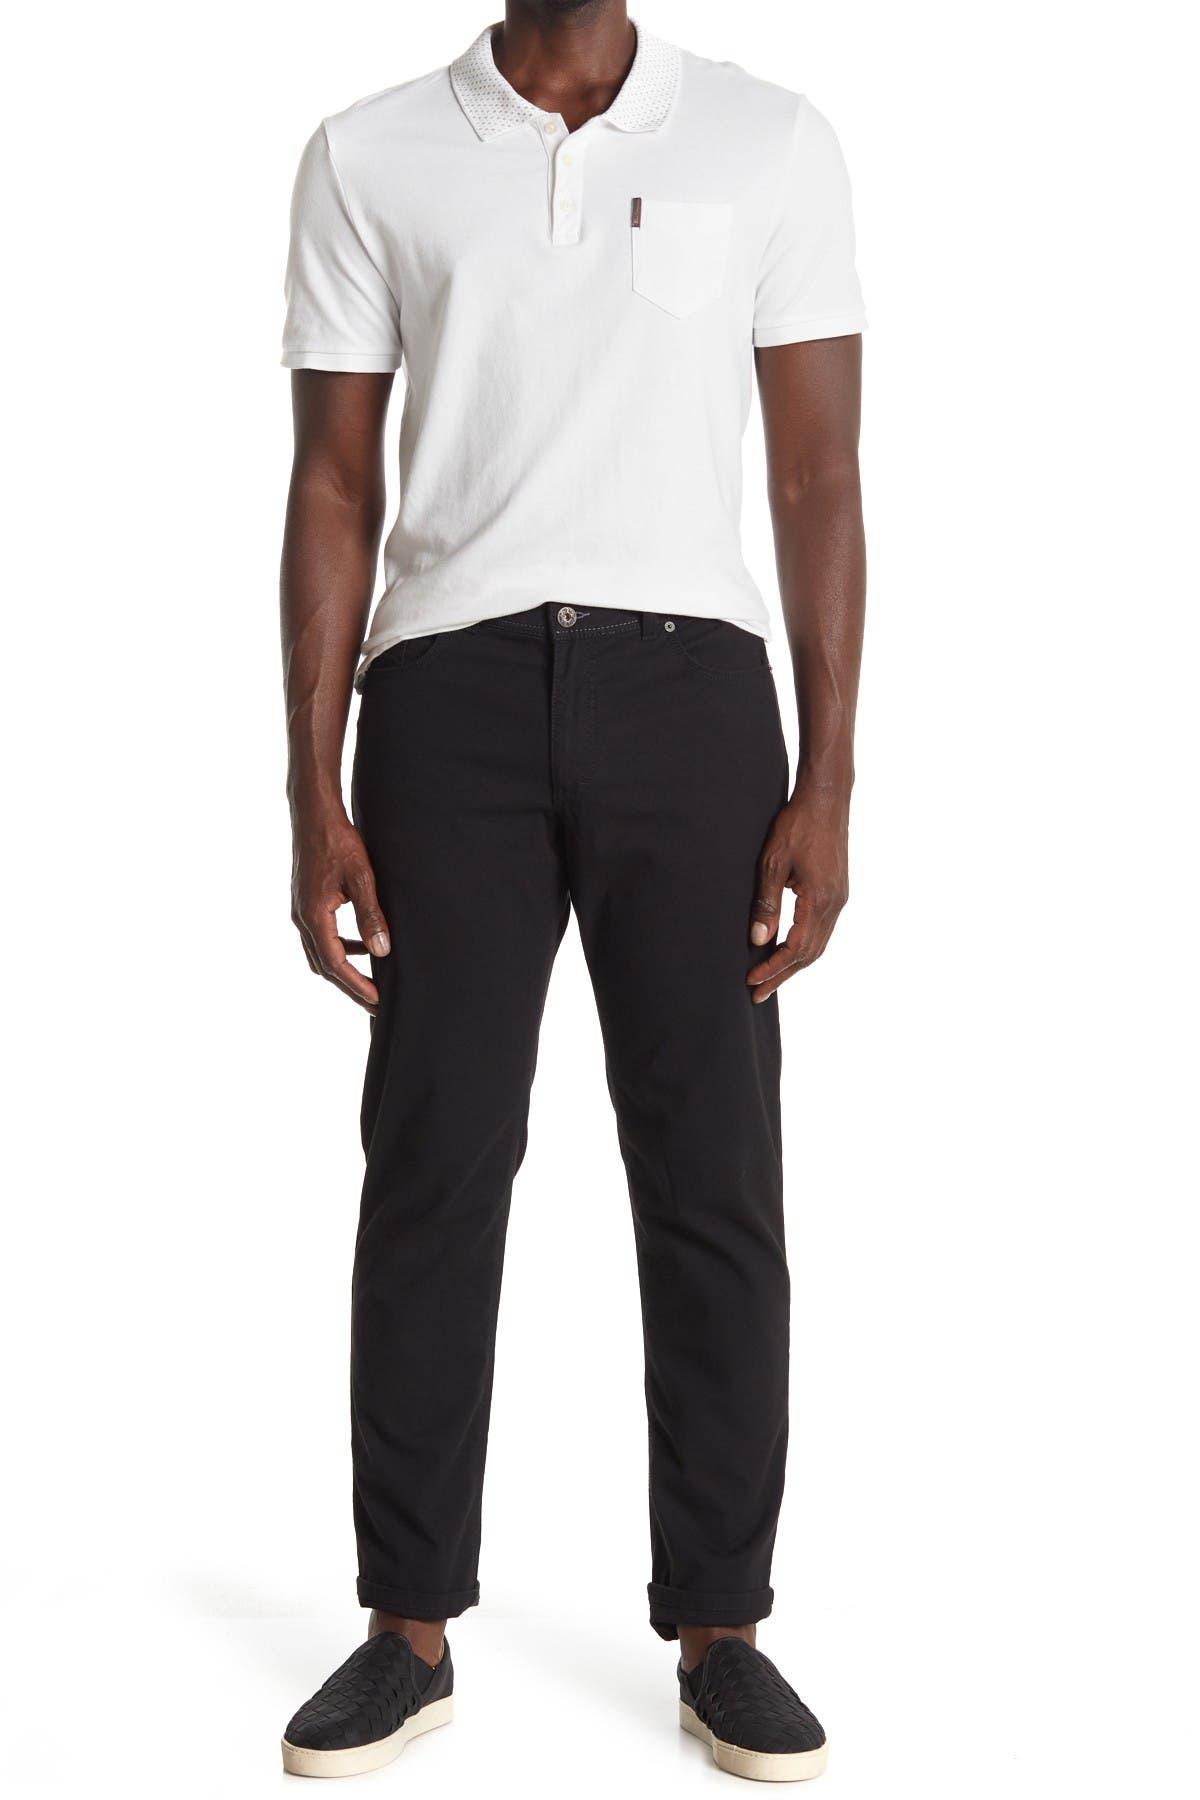 "Image of Brax Cooper Fancy Regular Fit Pants - 34"" Inseam"